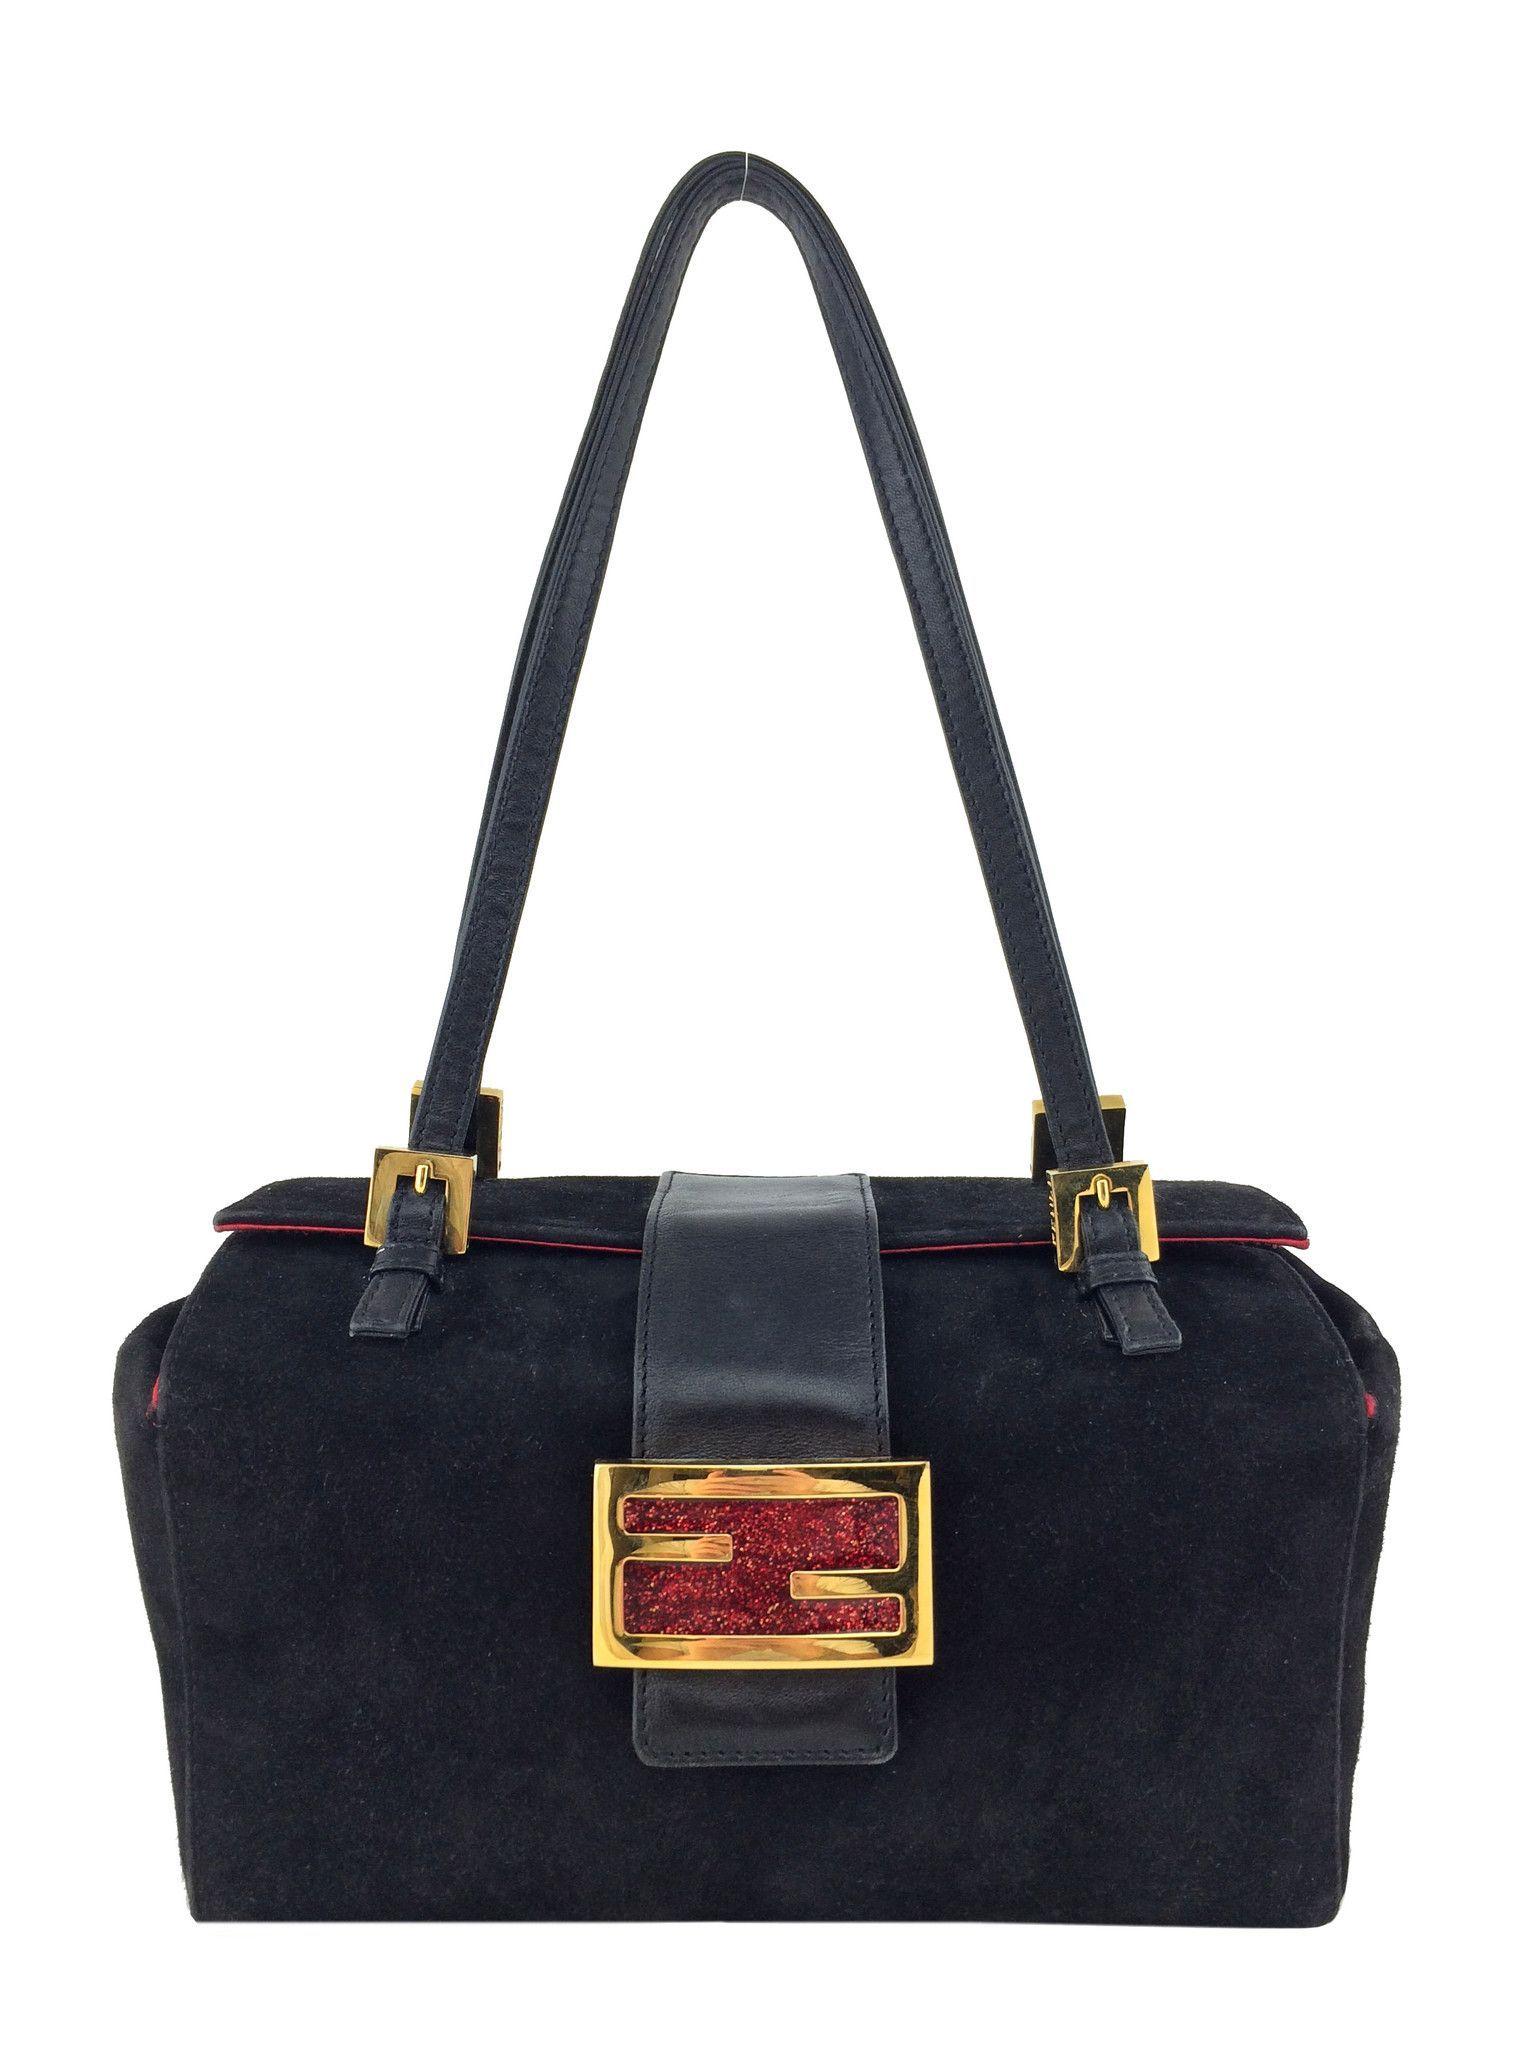 75c4f5f668 Fendi Suede Baguette Bag